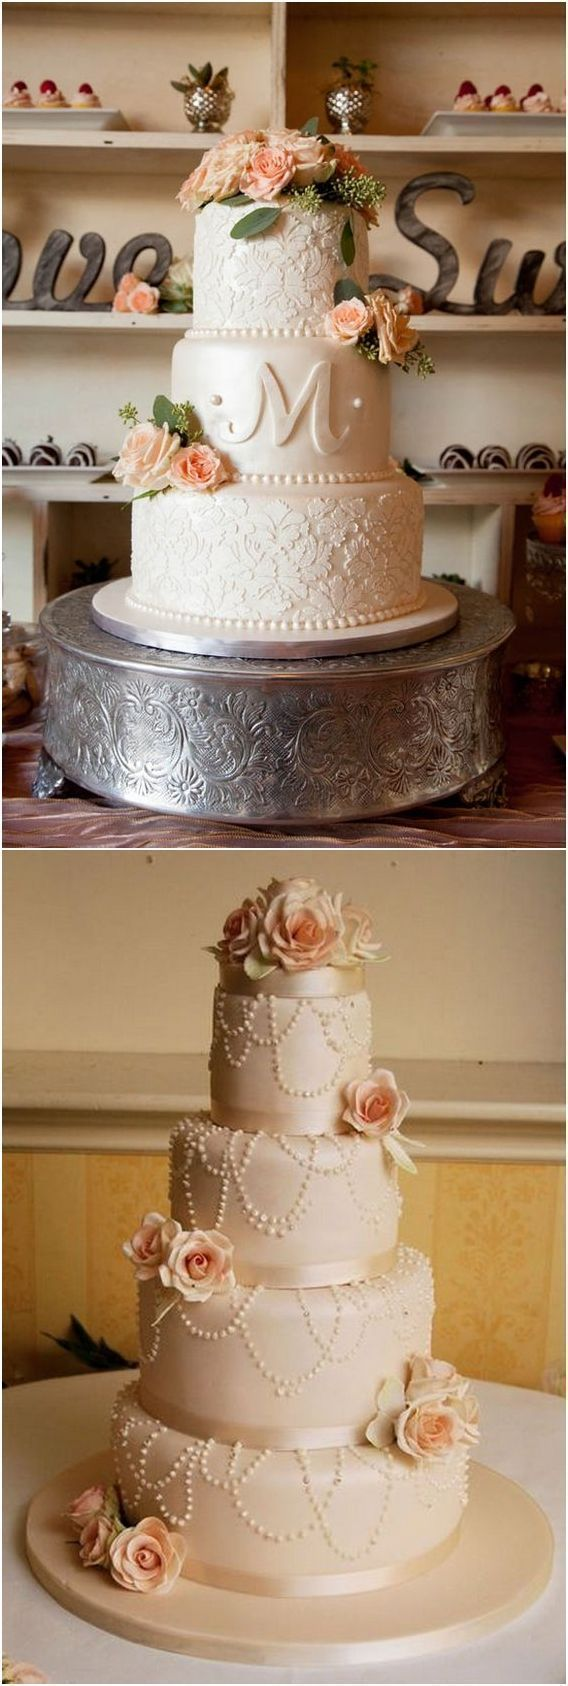 Vintage elegant wedding cake weddings weddingcakes cakes